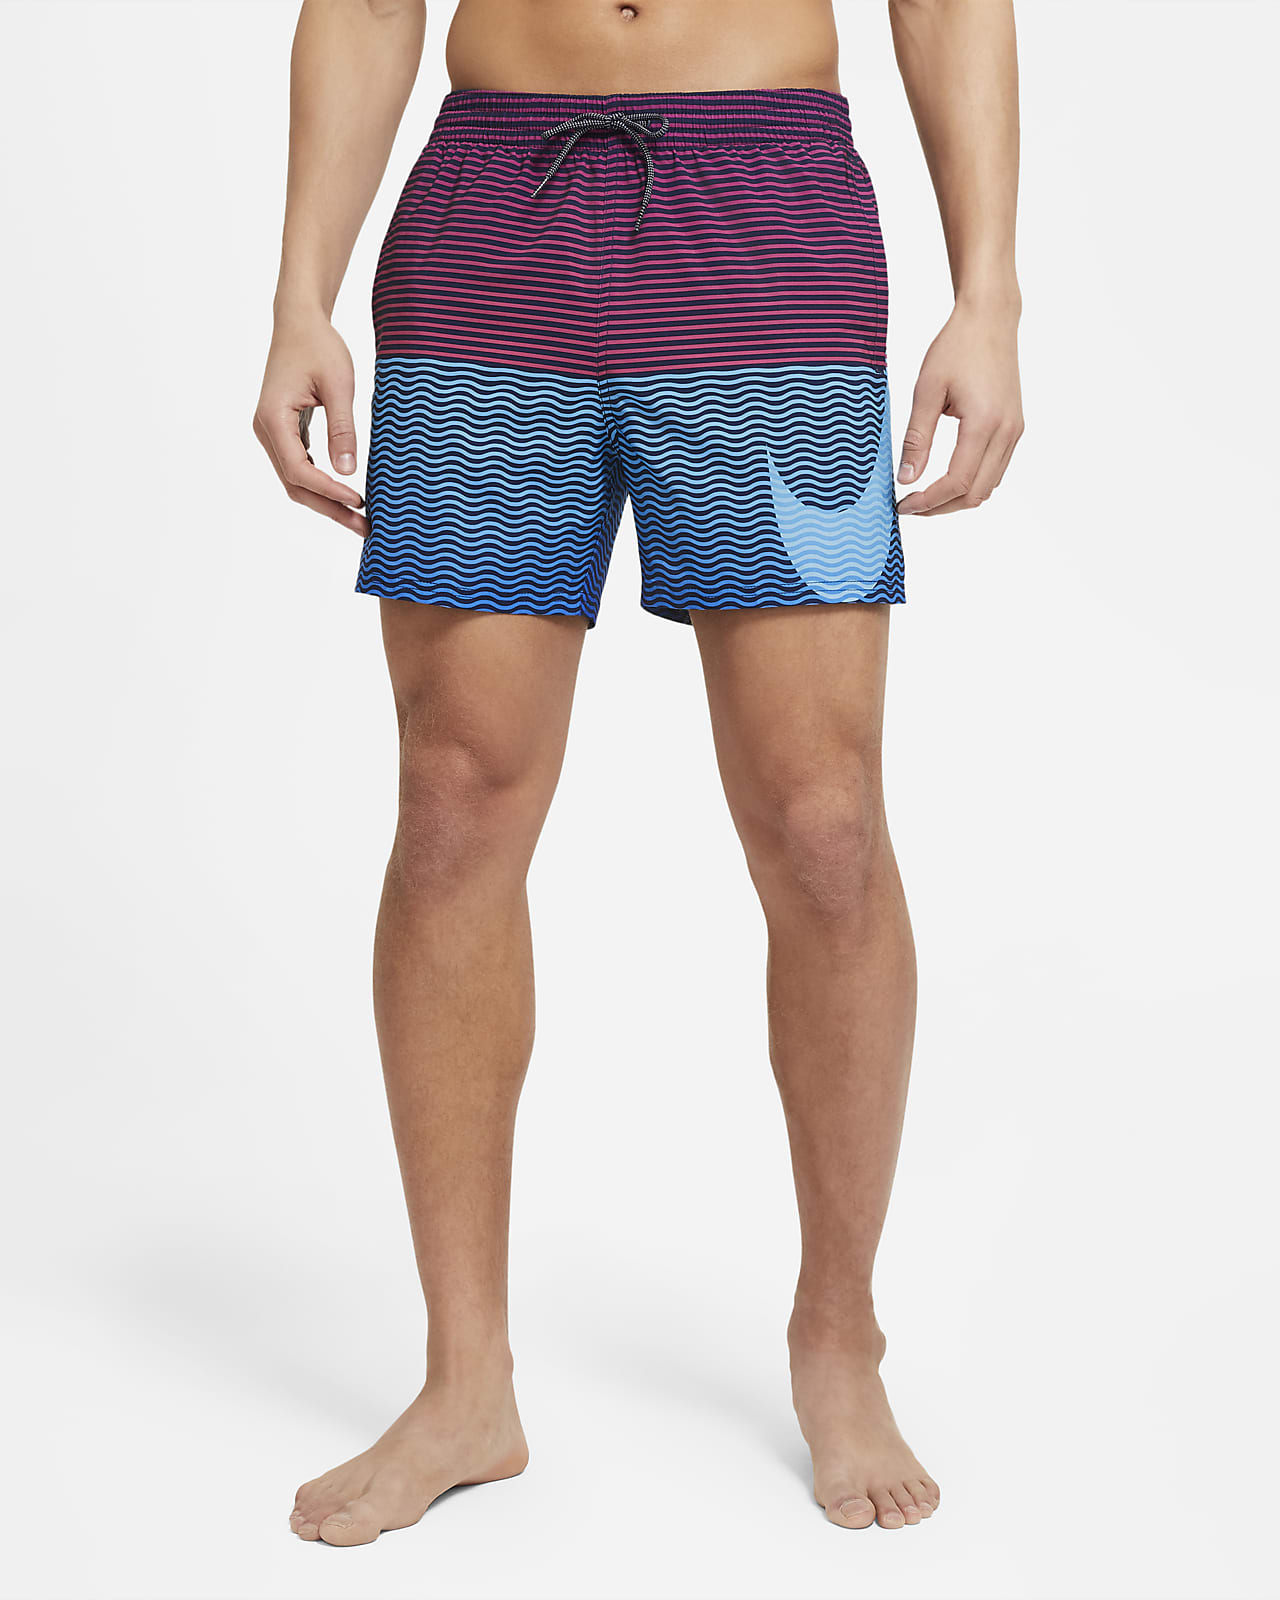 Nike Vital Herren-Badeshorts (ca. 12,5 cm)